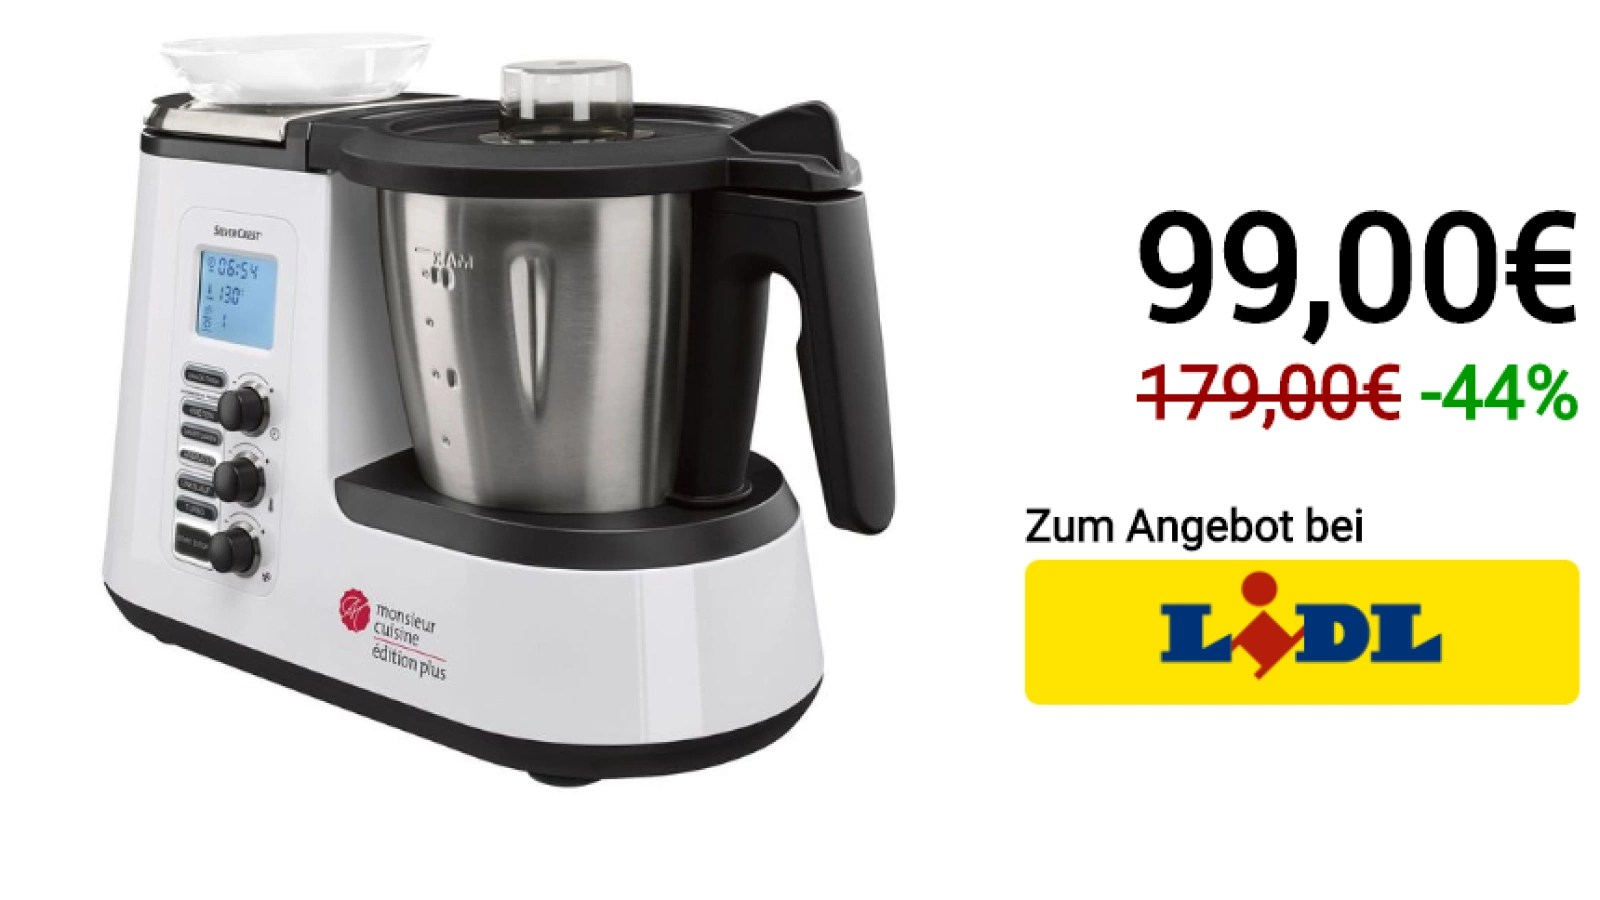 monsieur cuisine plus fur 99 euro bei